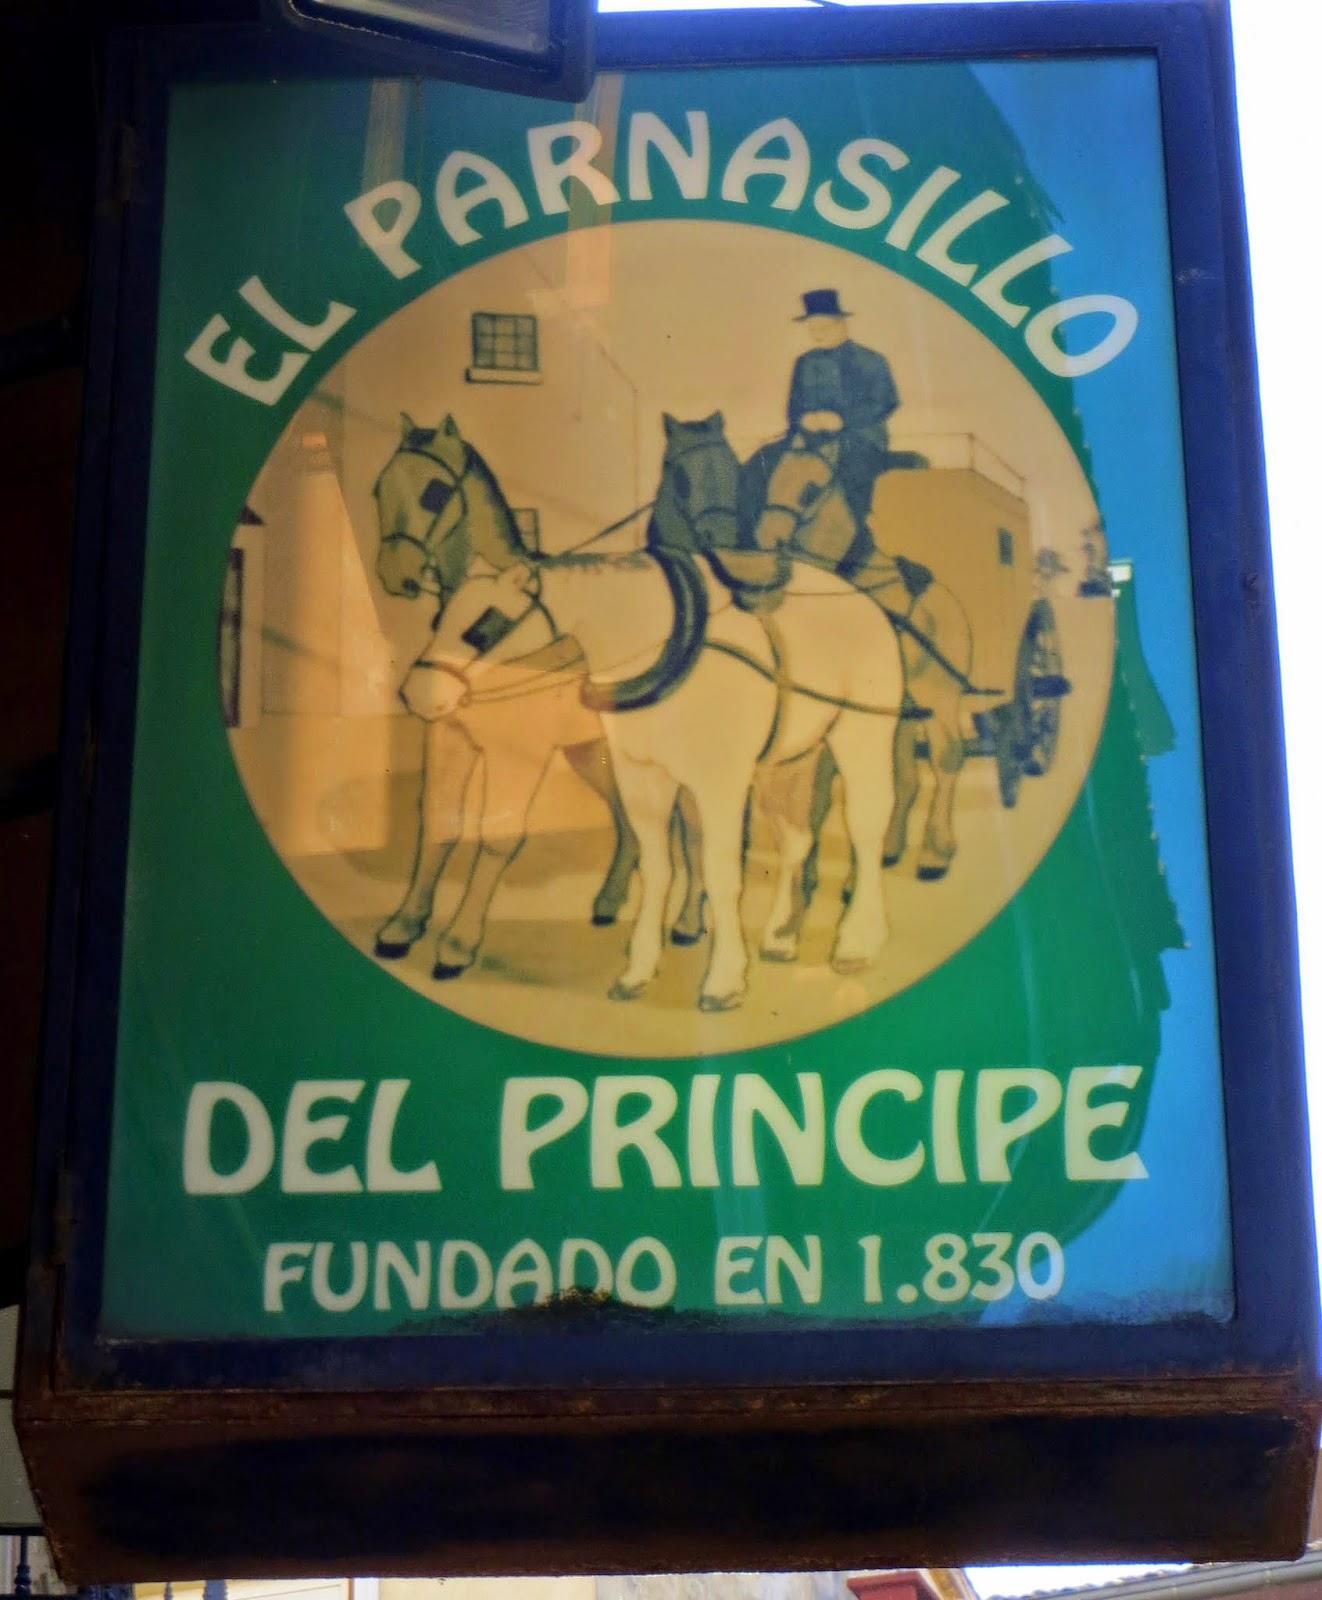 Azulejos Maroto Espantaleón, calle Príncipe 33